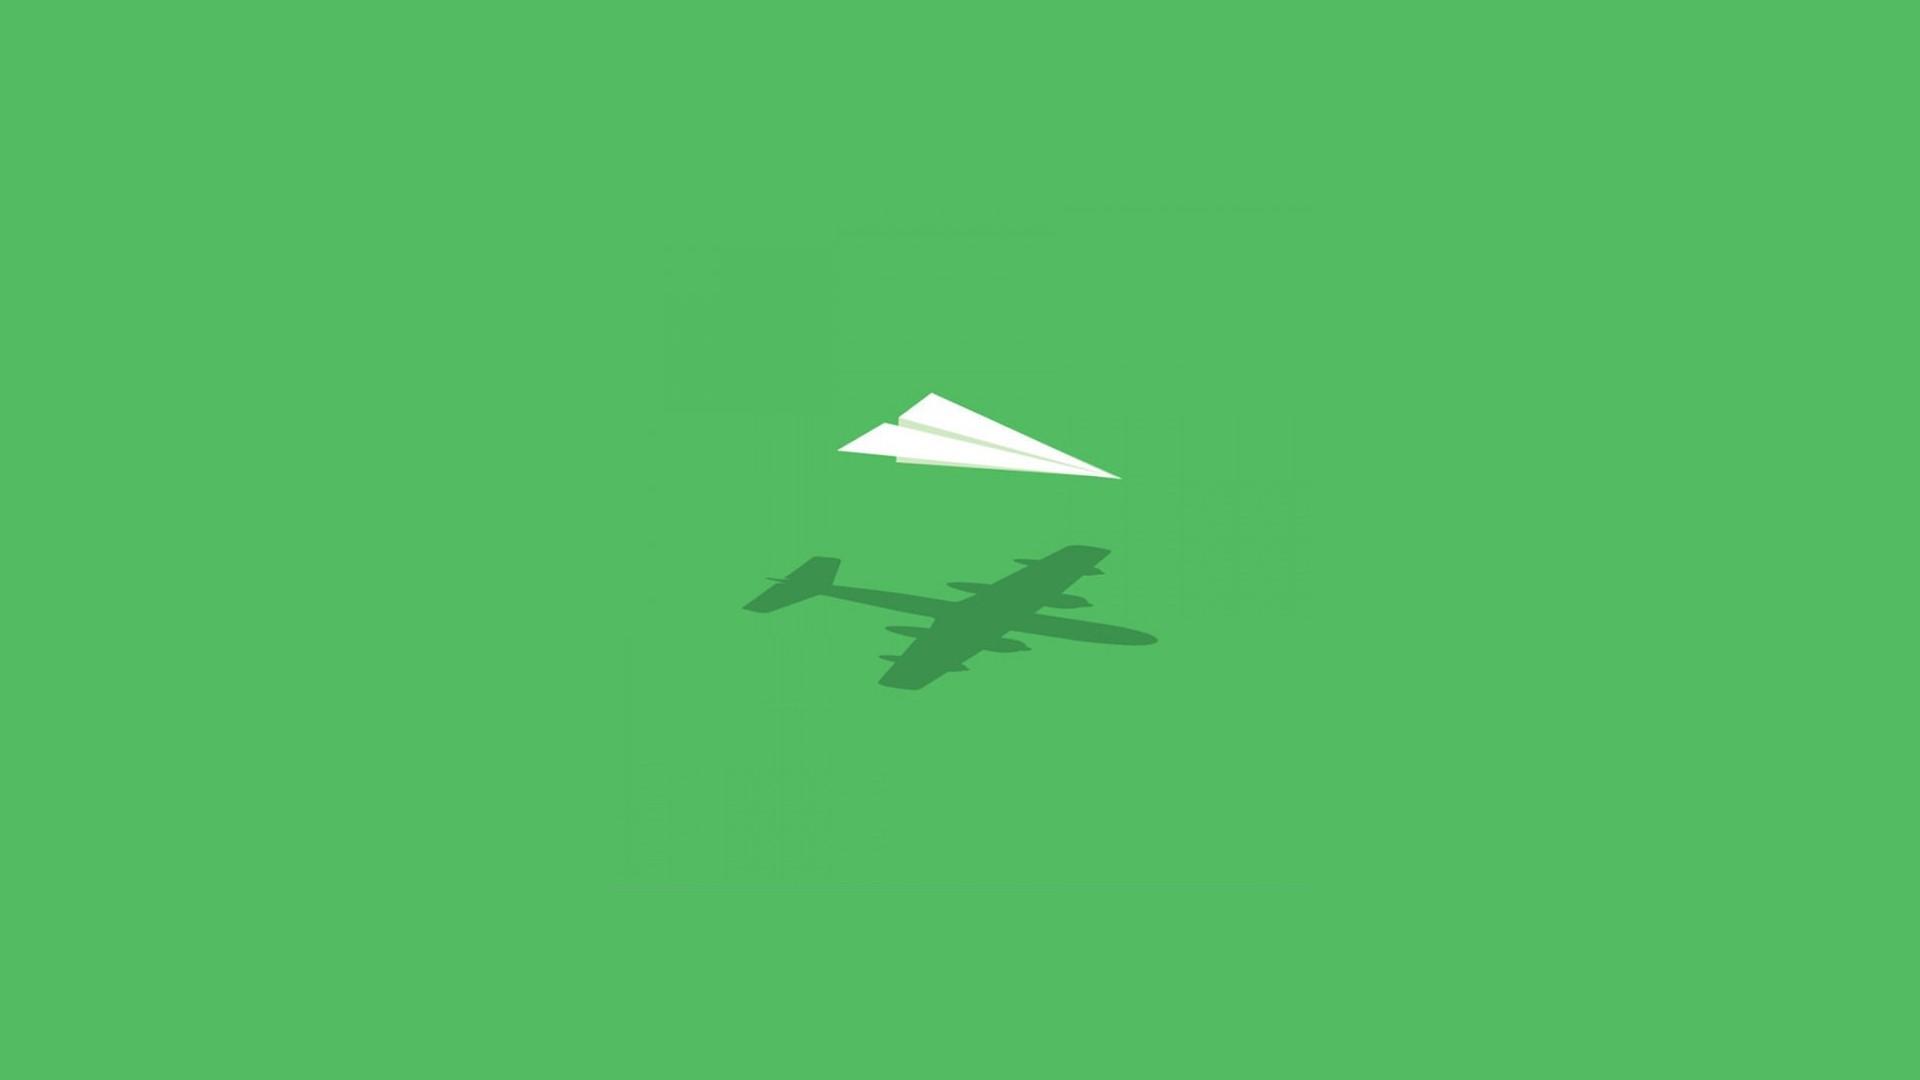 Aircraft Minimalistic Wall Humor Imagination Paper Plane Wallpaper